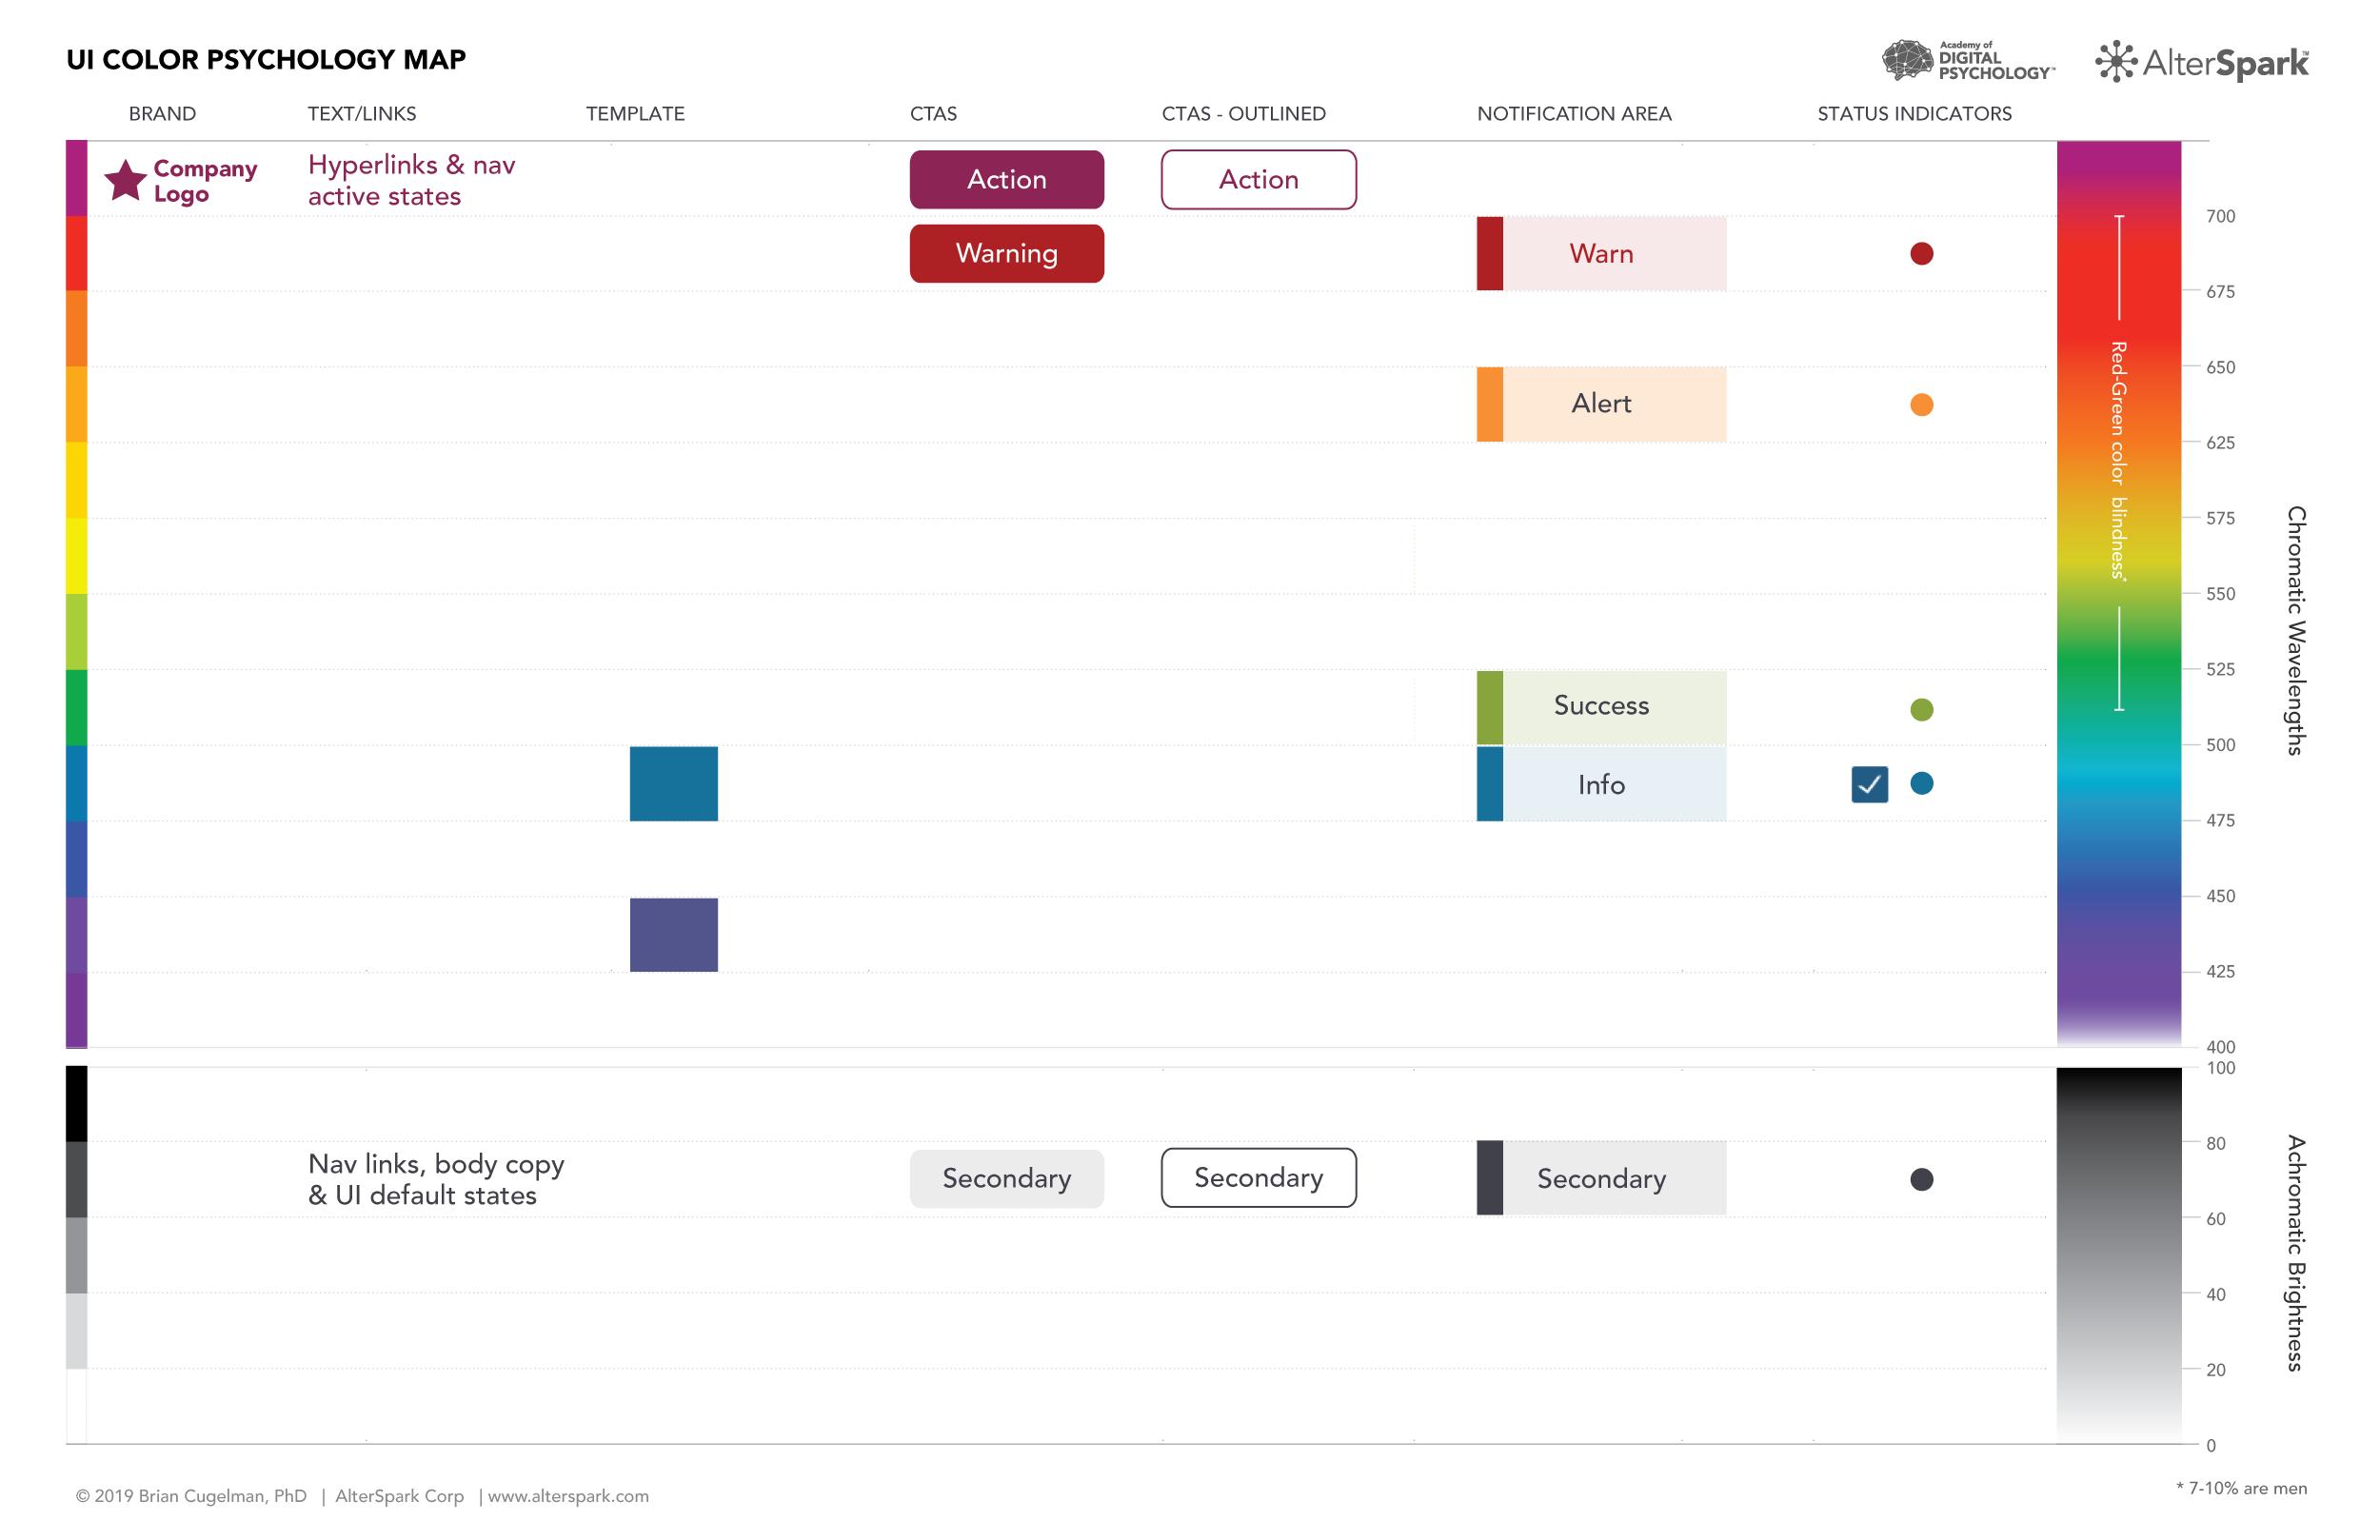 UI Color Psychology Map